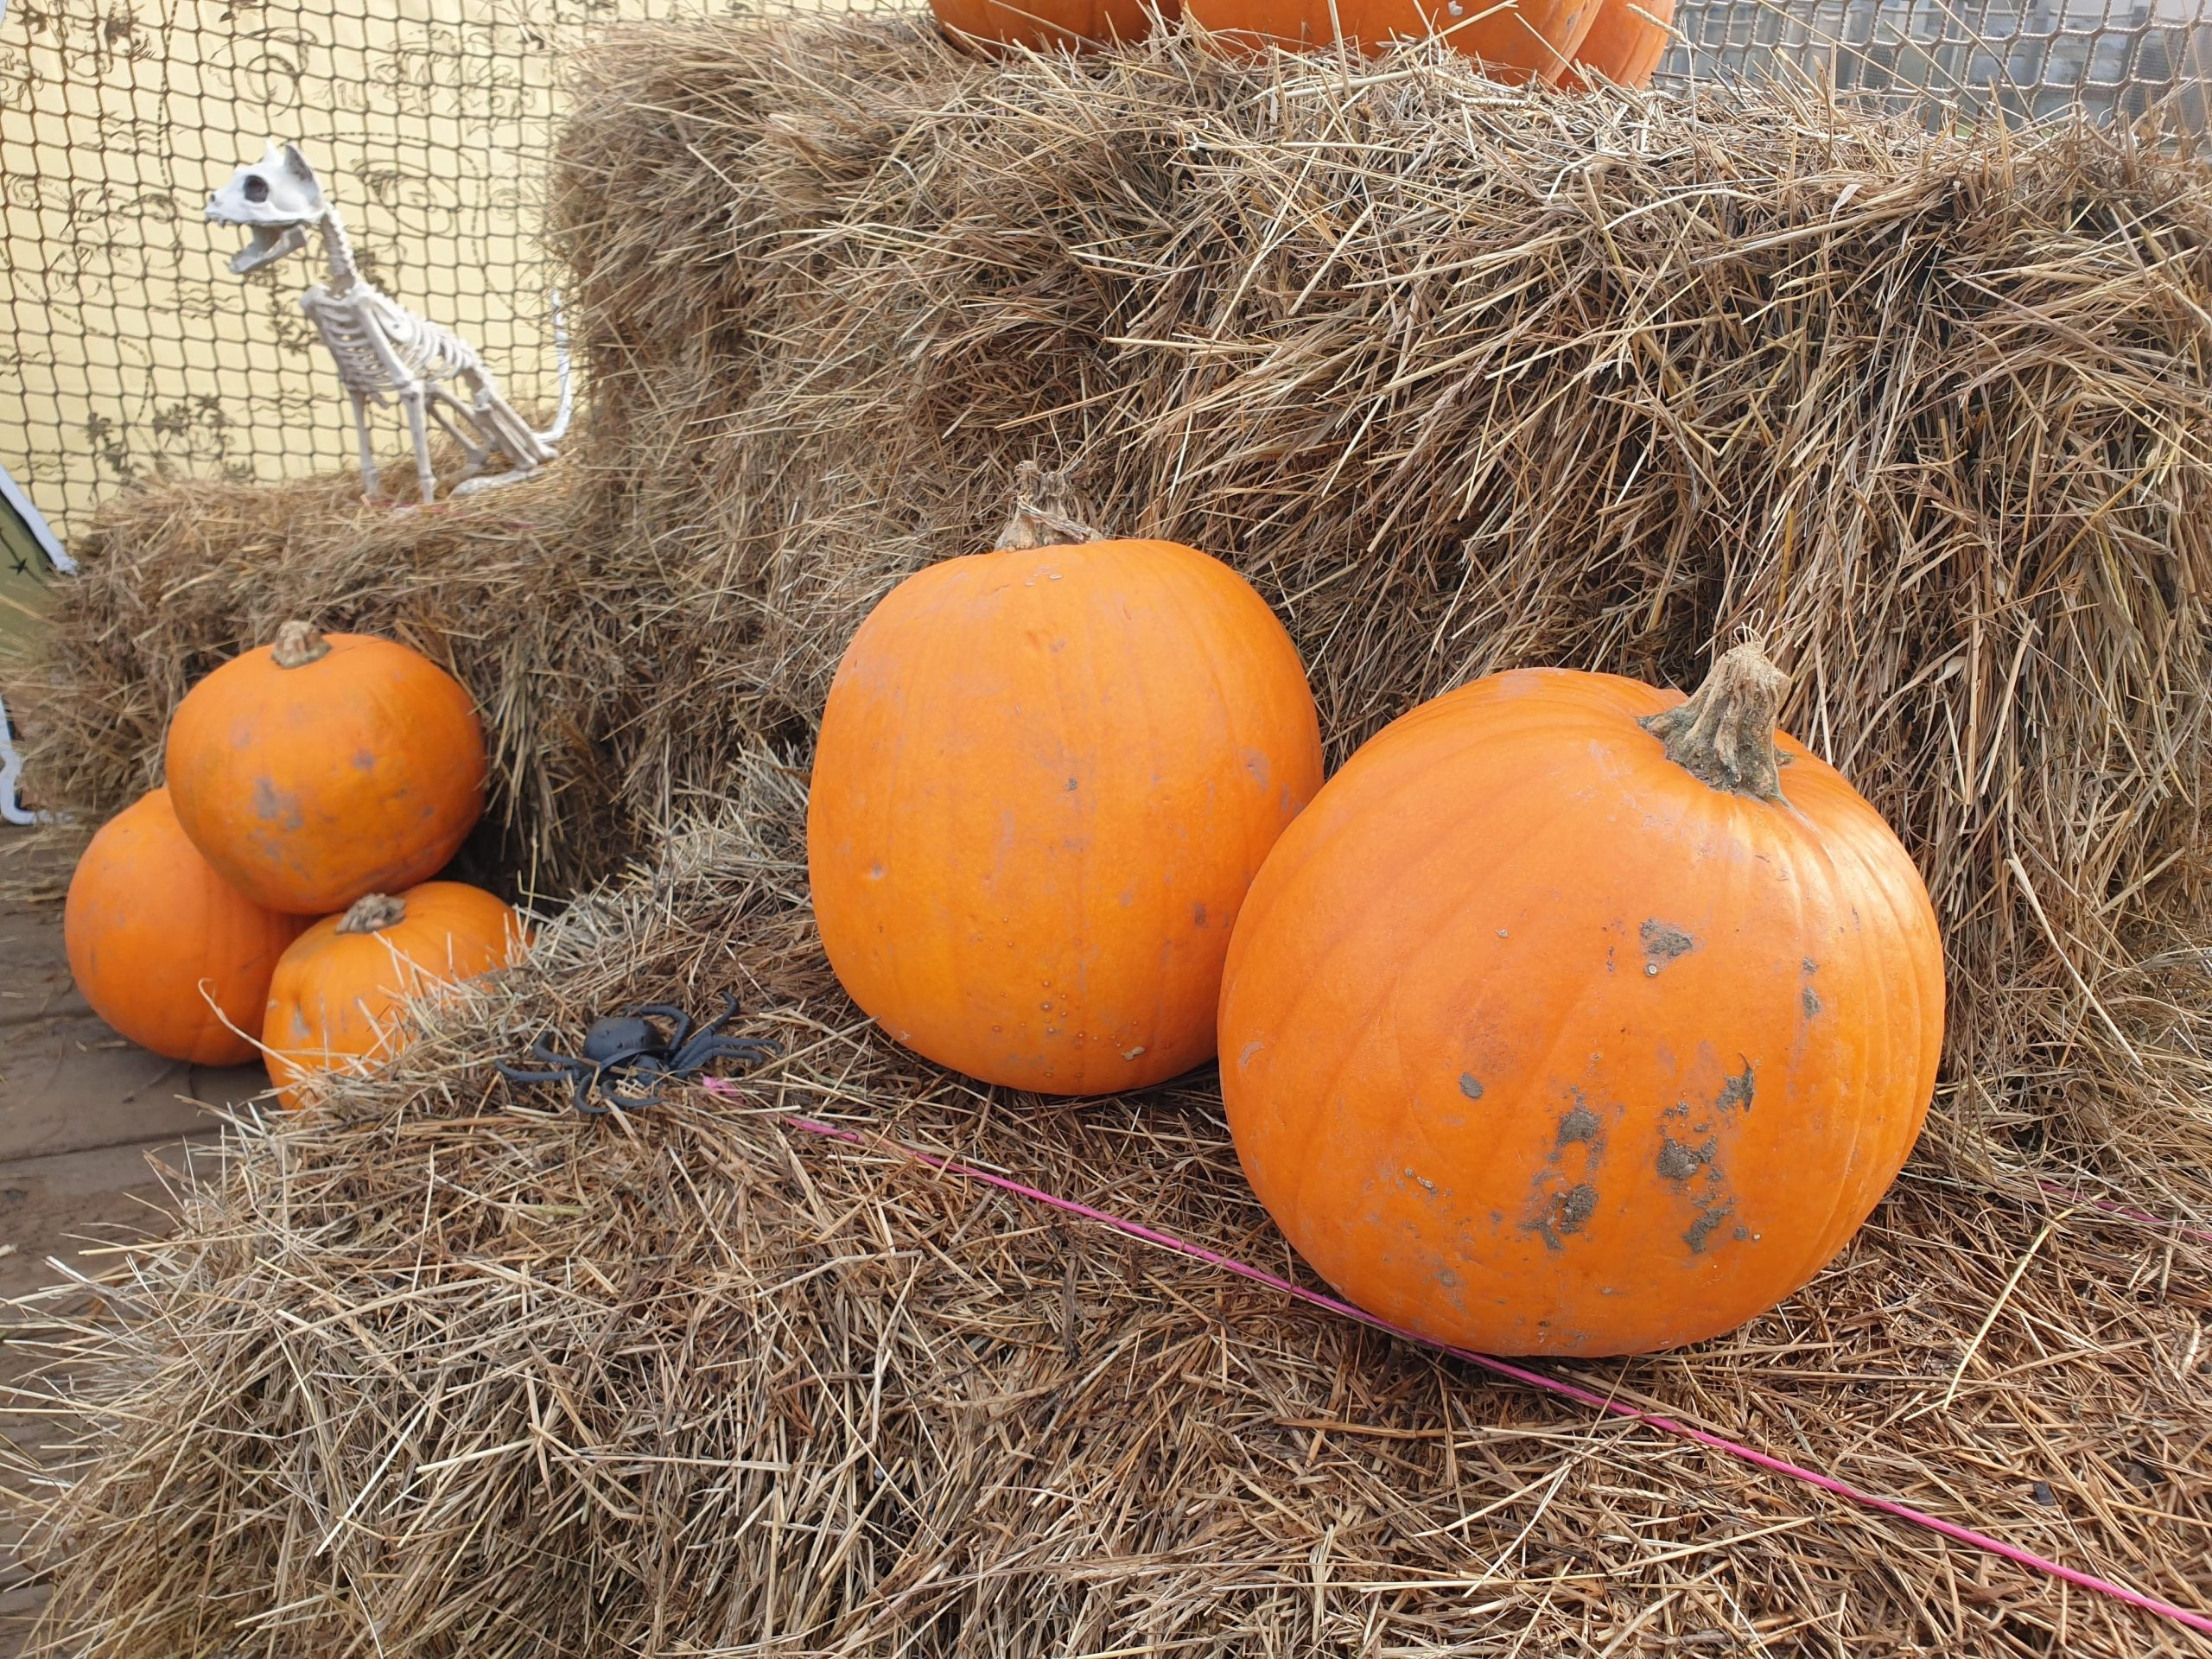 Halloween pumpkin display on decking area